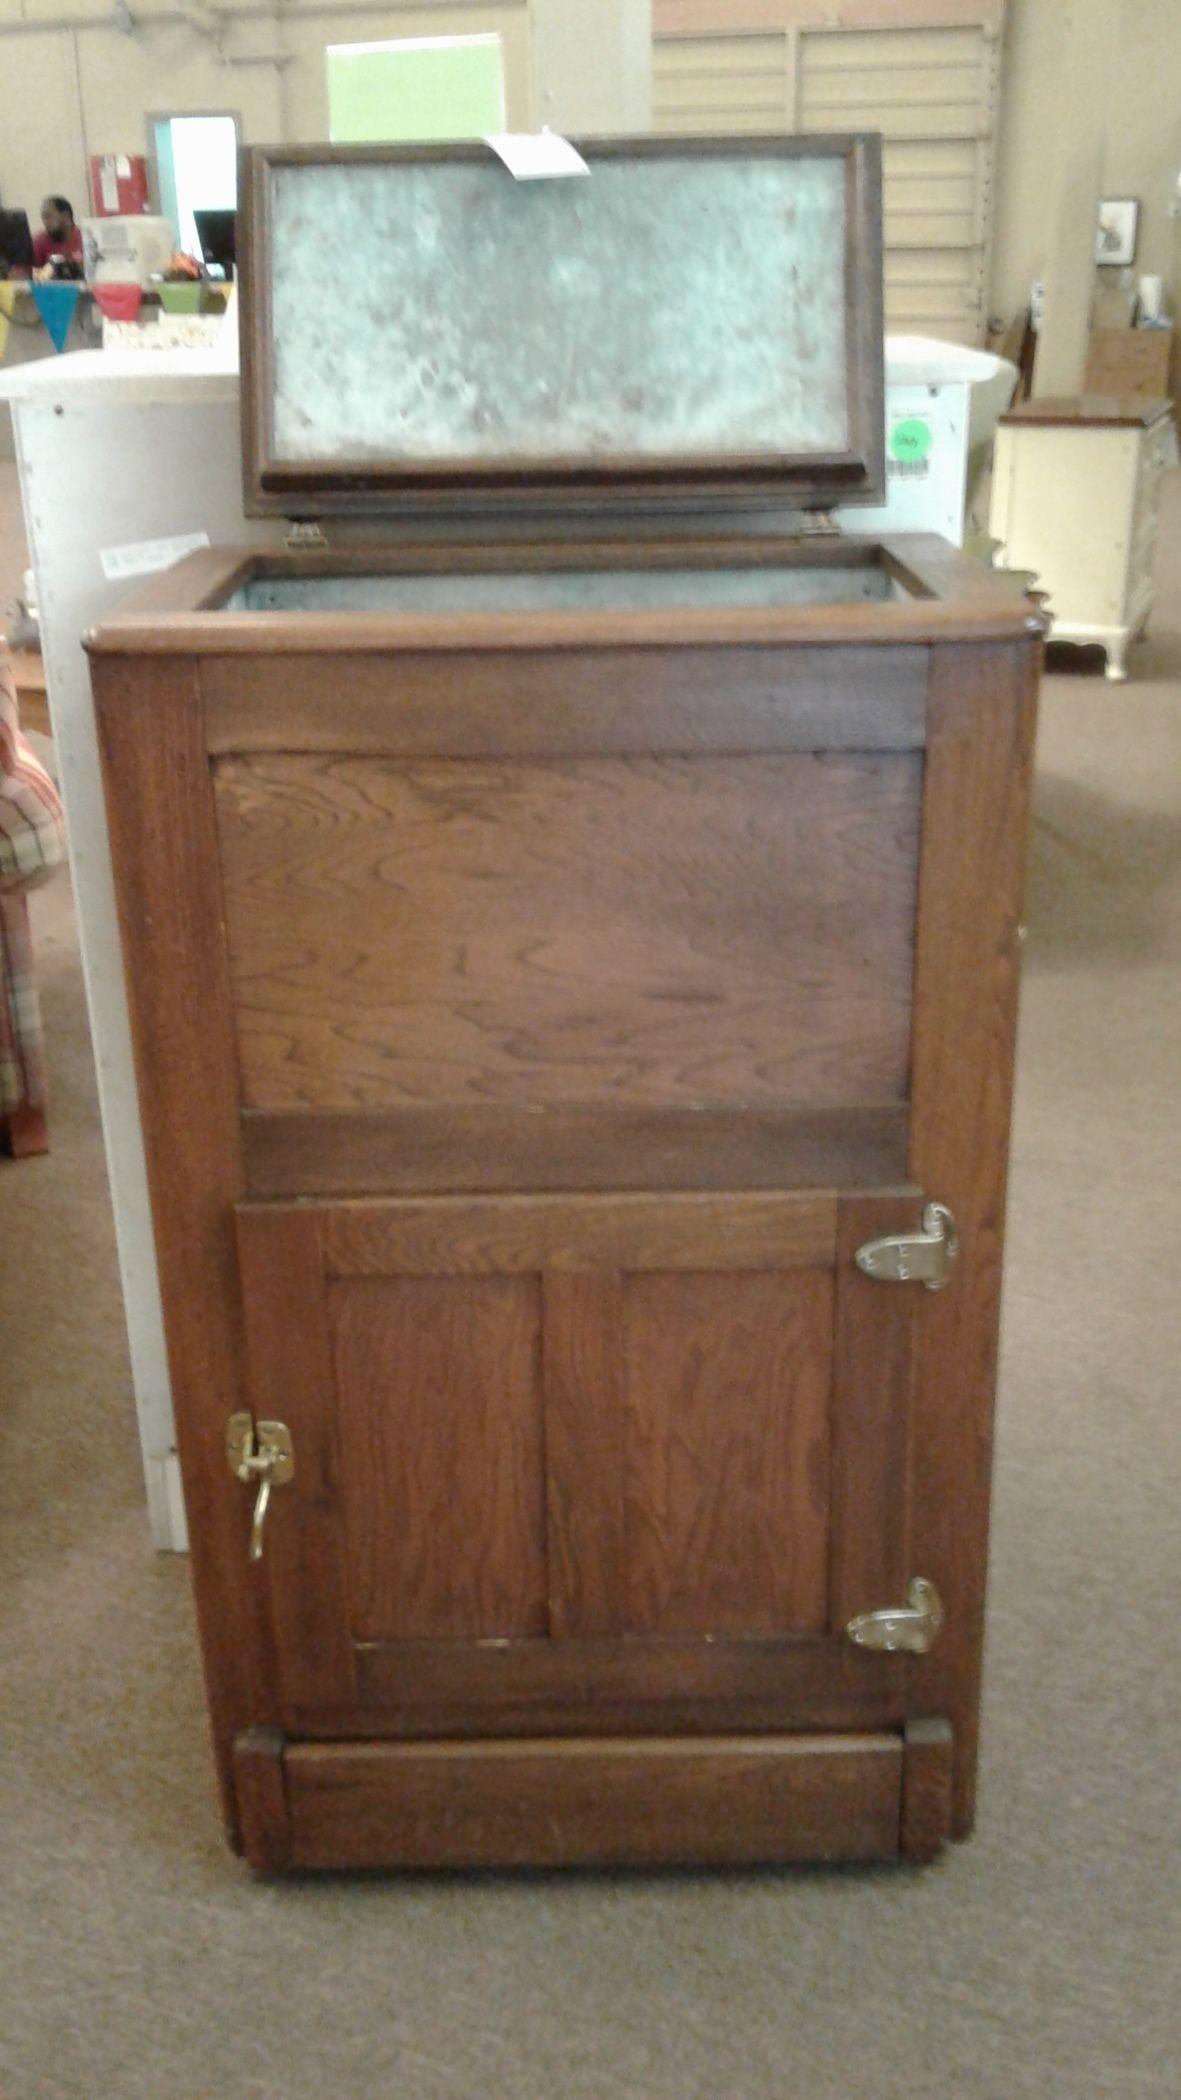 ANTIQUE OAK ICE BOX Delmarva Furniture Consignment